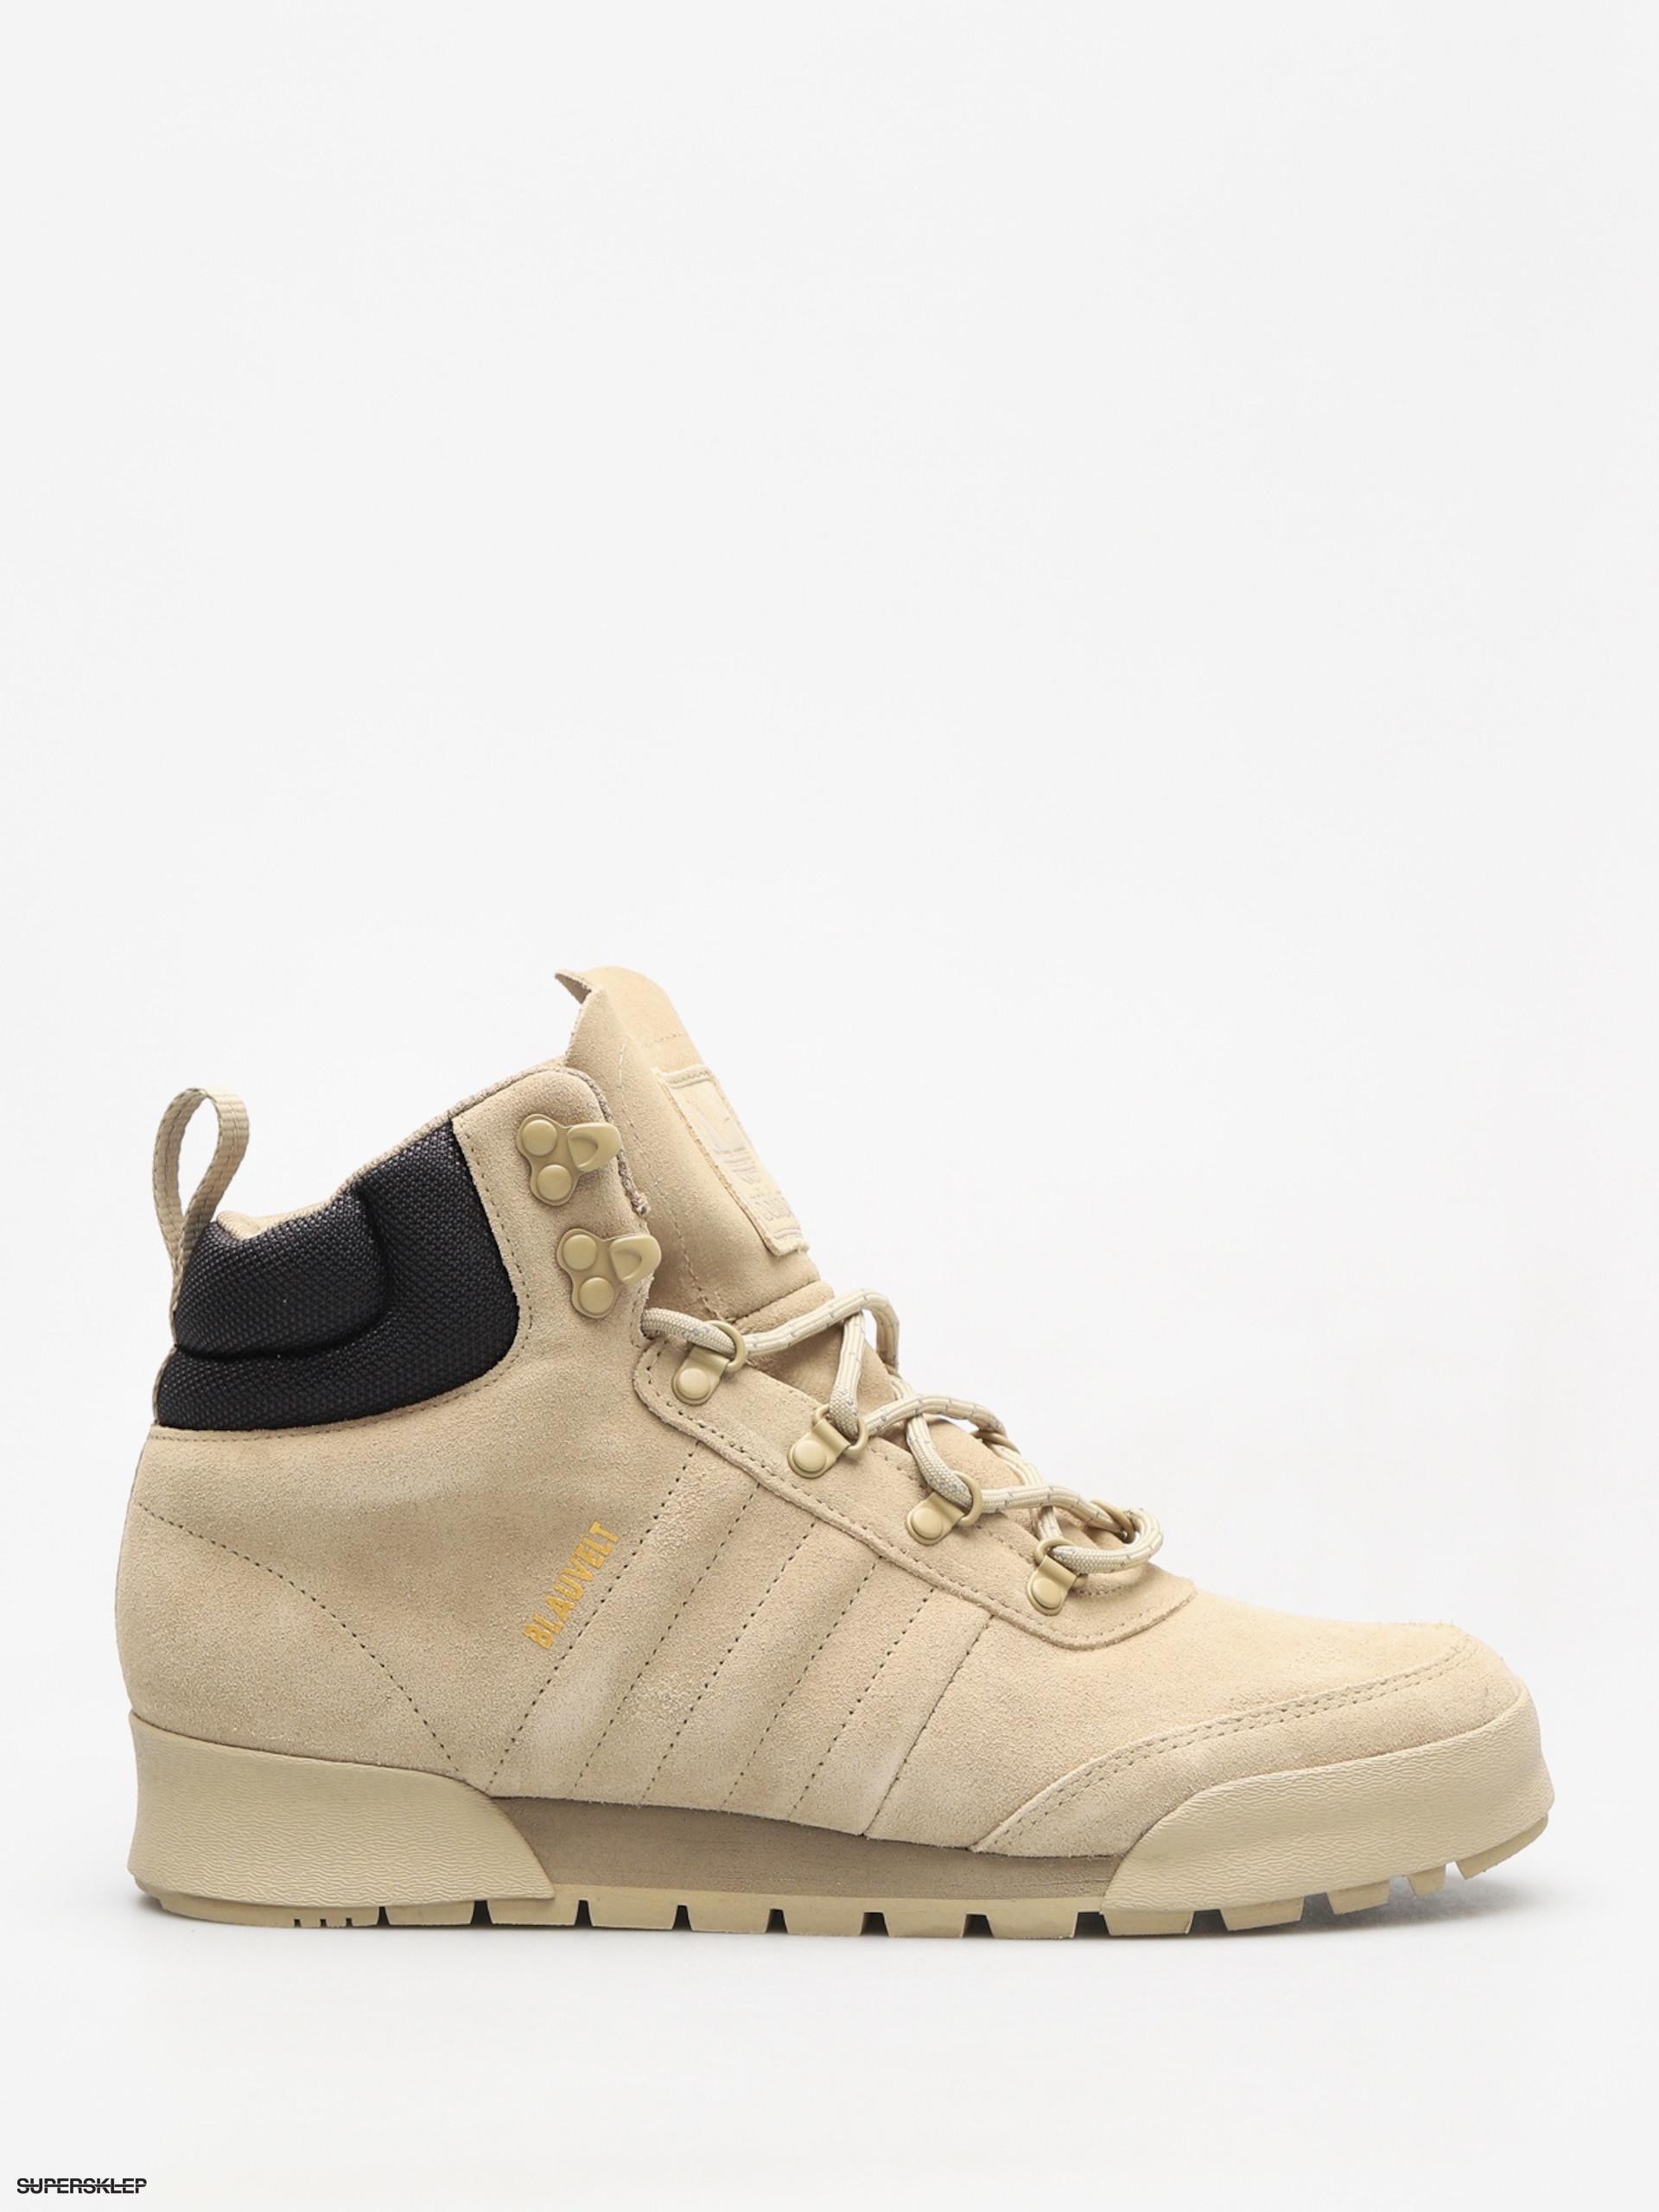 Zimné topánky adidas Jake Boot 2.0 (rawgol cblack goldmt) 2639d43a6b1